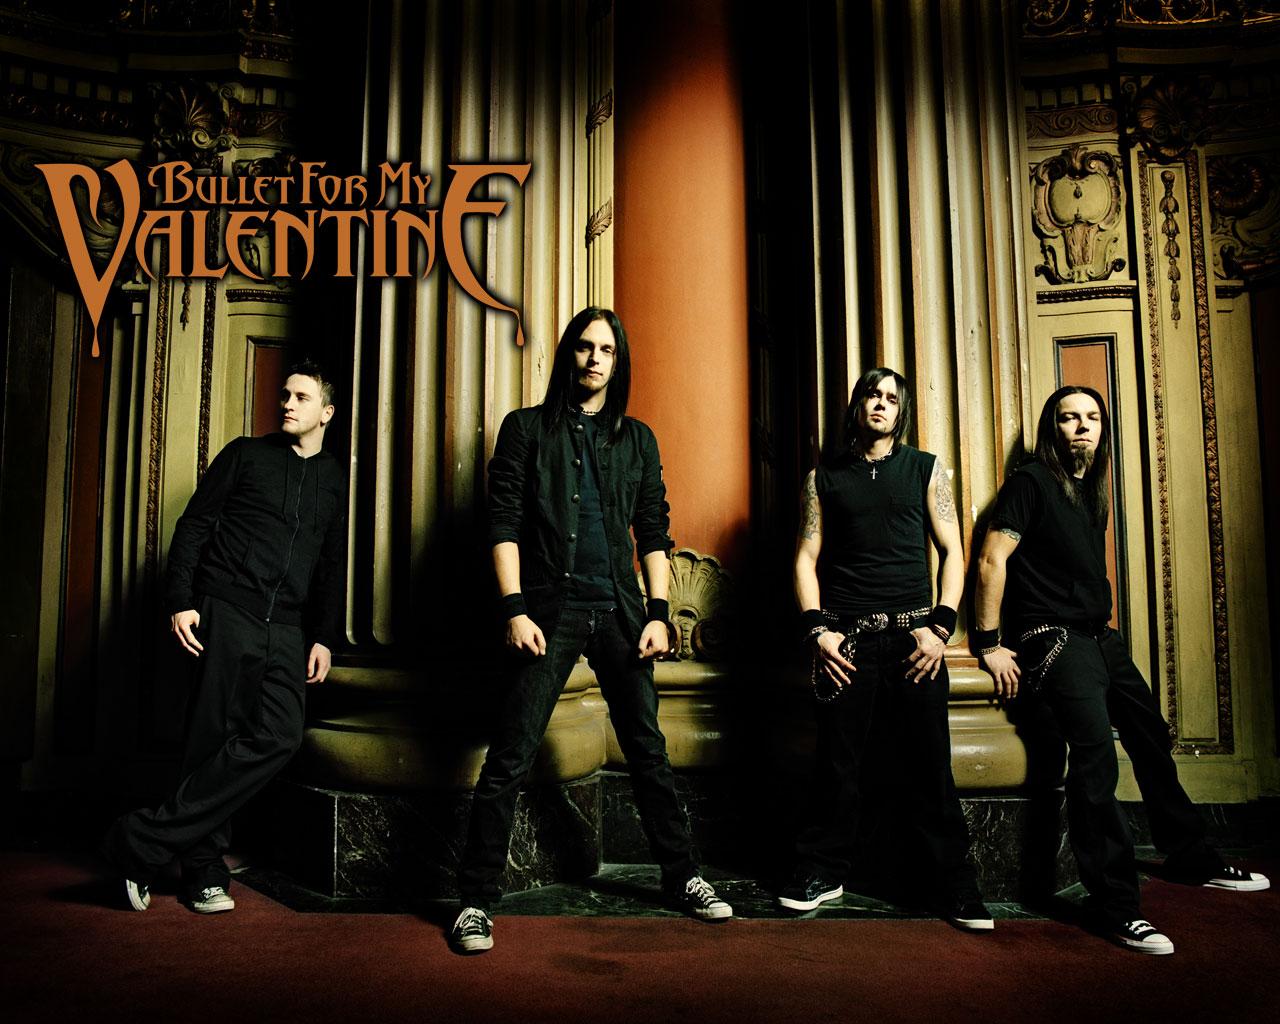 http://2.bp.blogspot.com/_-N52qof2_B8/TTszM53WGfI/AAAAAAAAA-s/p6XMu1gsHPs/s1600/bullet_for_my_valentine_3.jpg